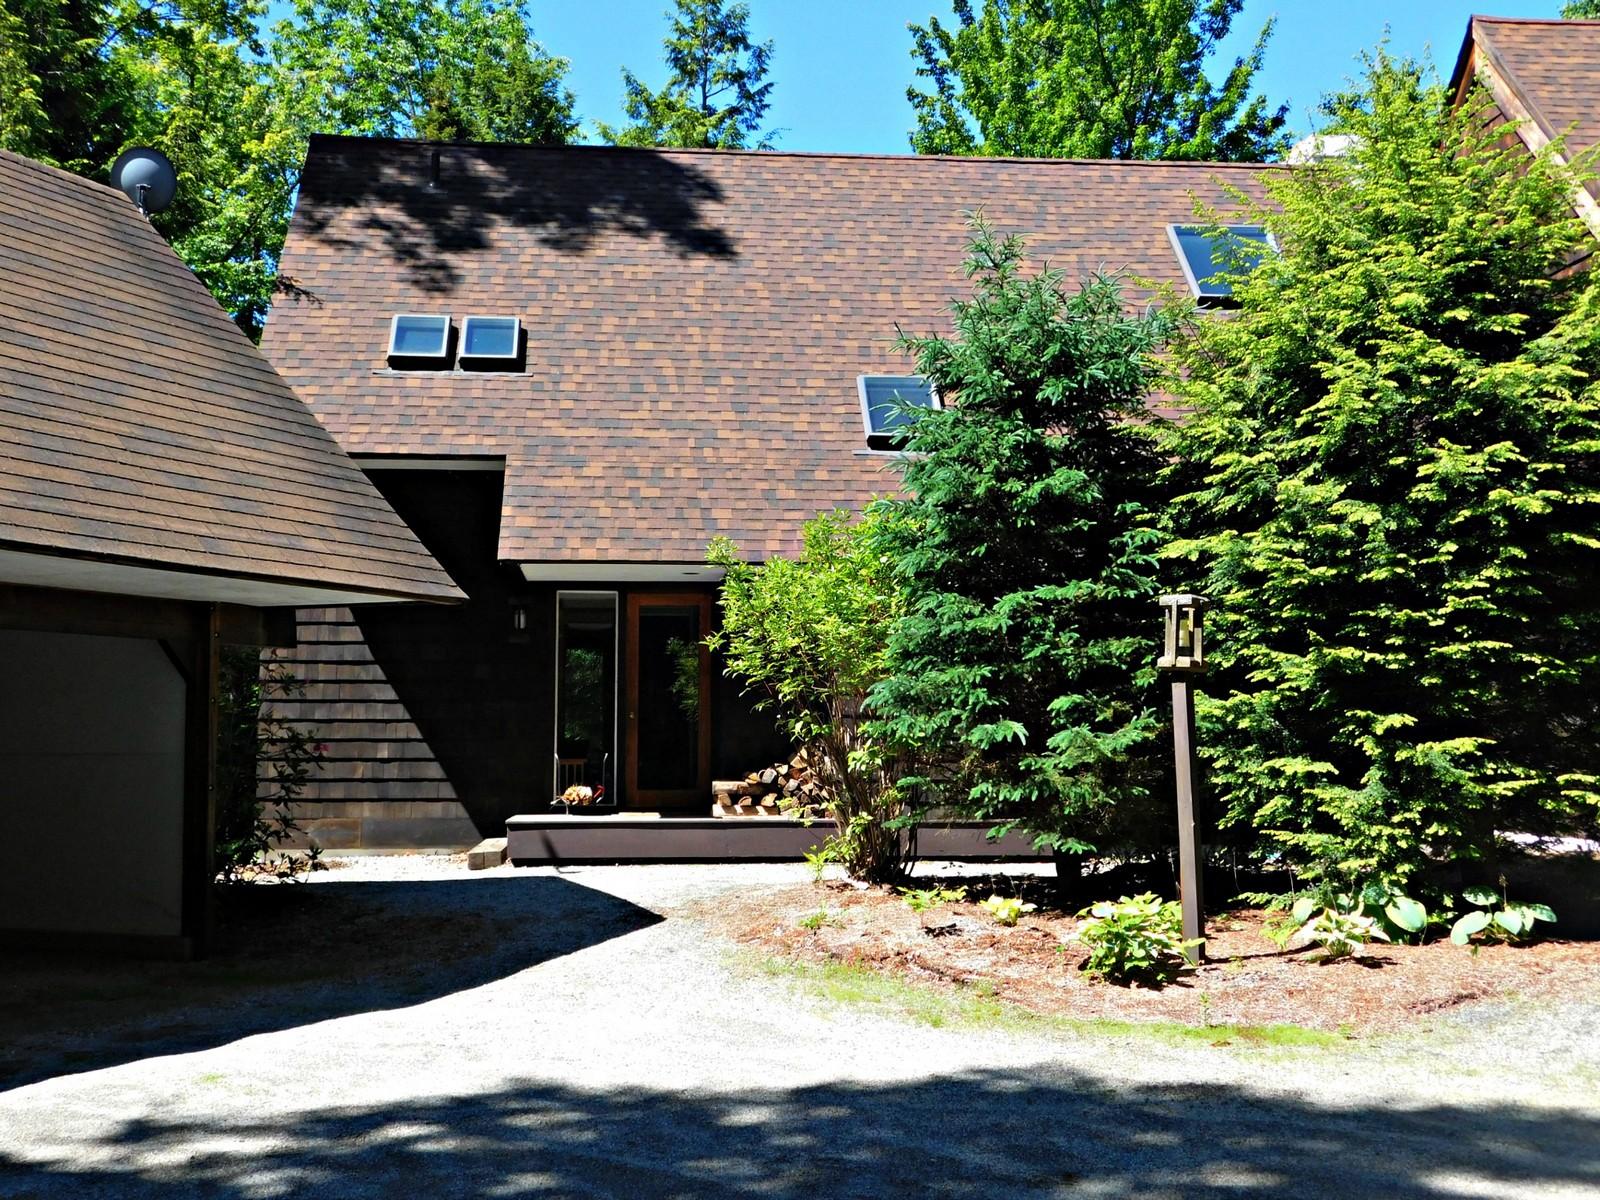 Condominium for Sale at 82 Pond 82, Winhall 82 Pond Vw 82 Winhall, Vermont, 05340 United States